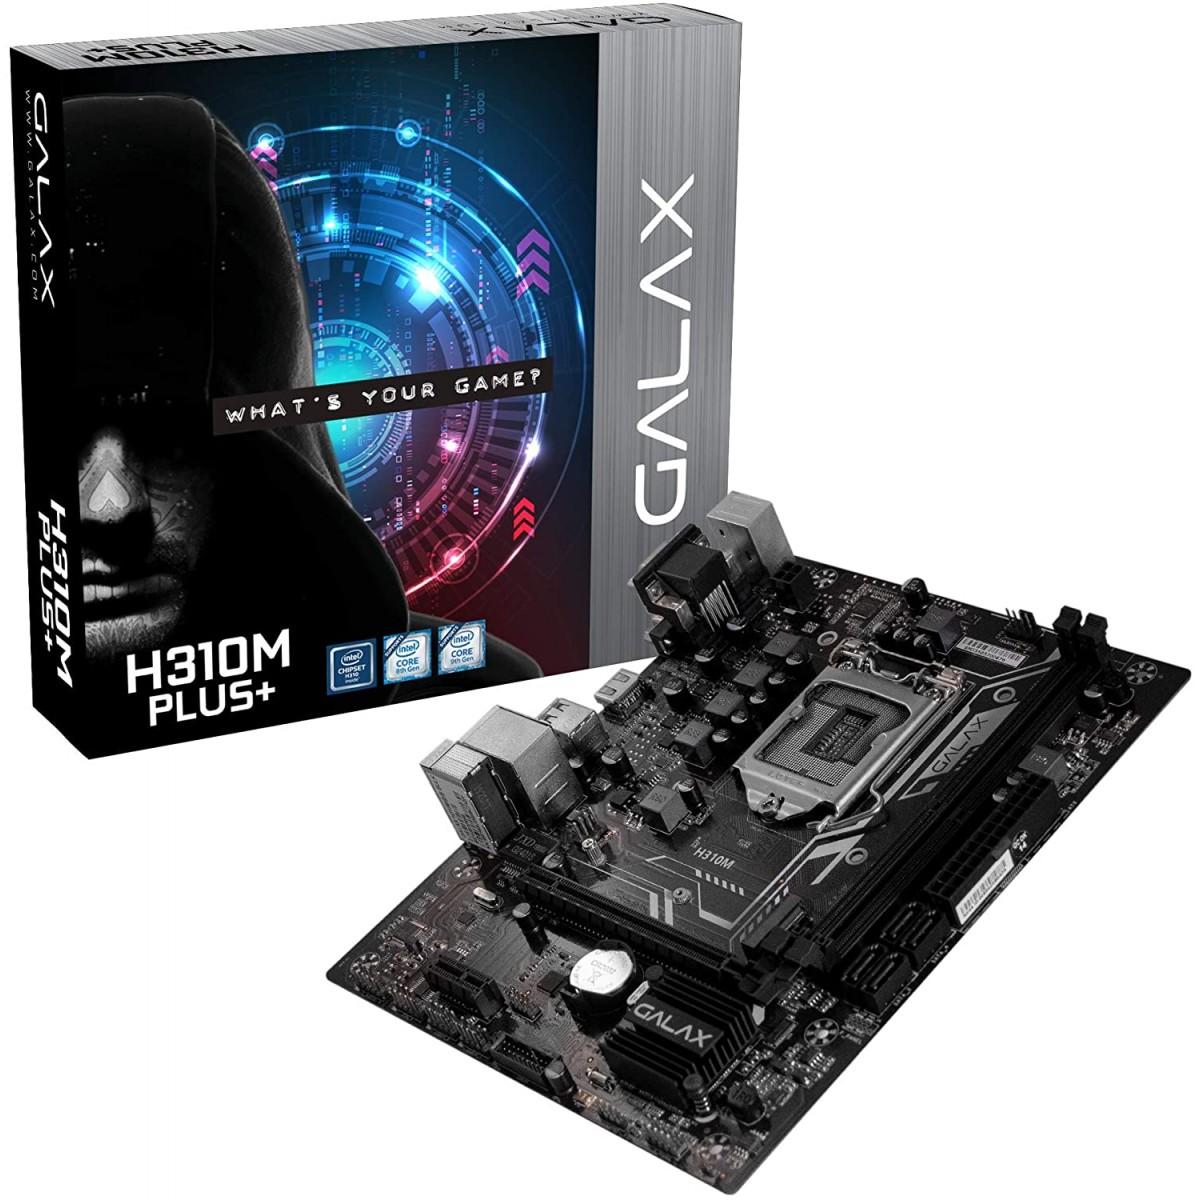 Placa Mãe Galax H310M Plus+, Chipset H310, Intel LGA 1151, mATX, DDR4, IH31CMAGCXJ1CW